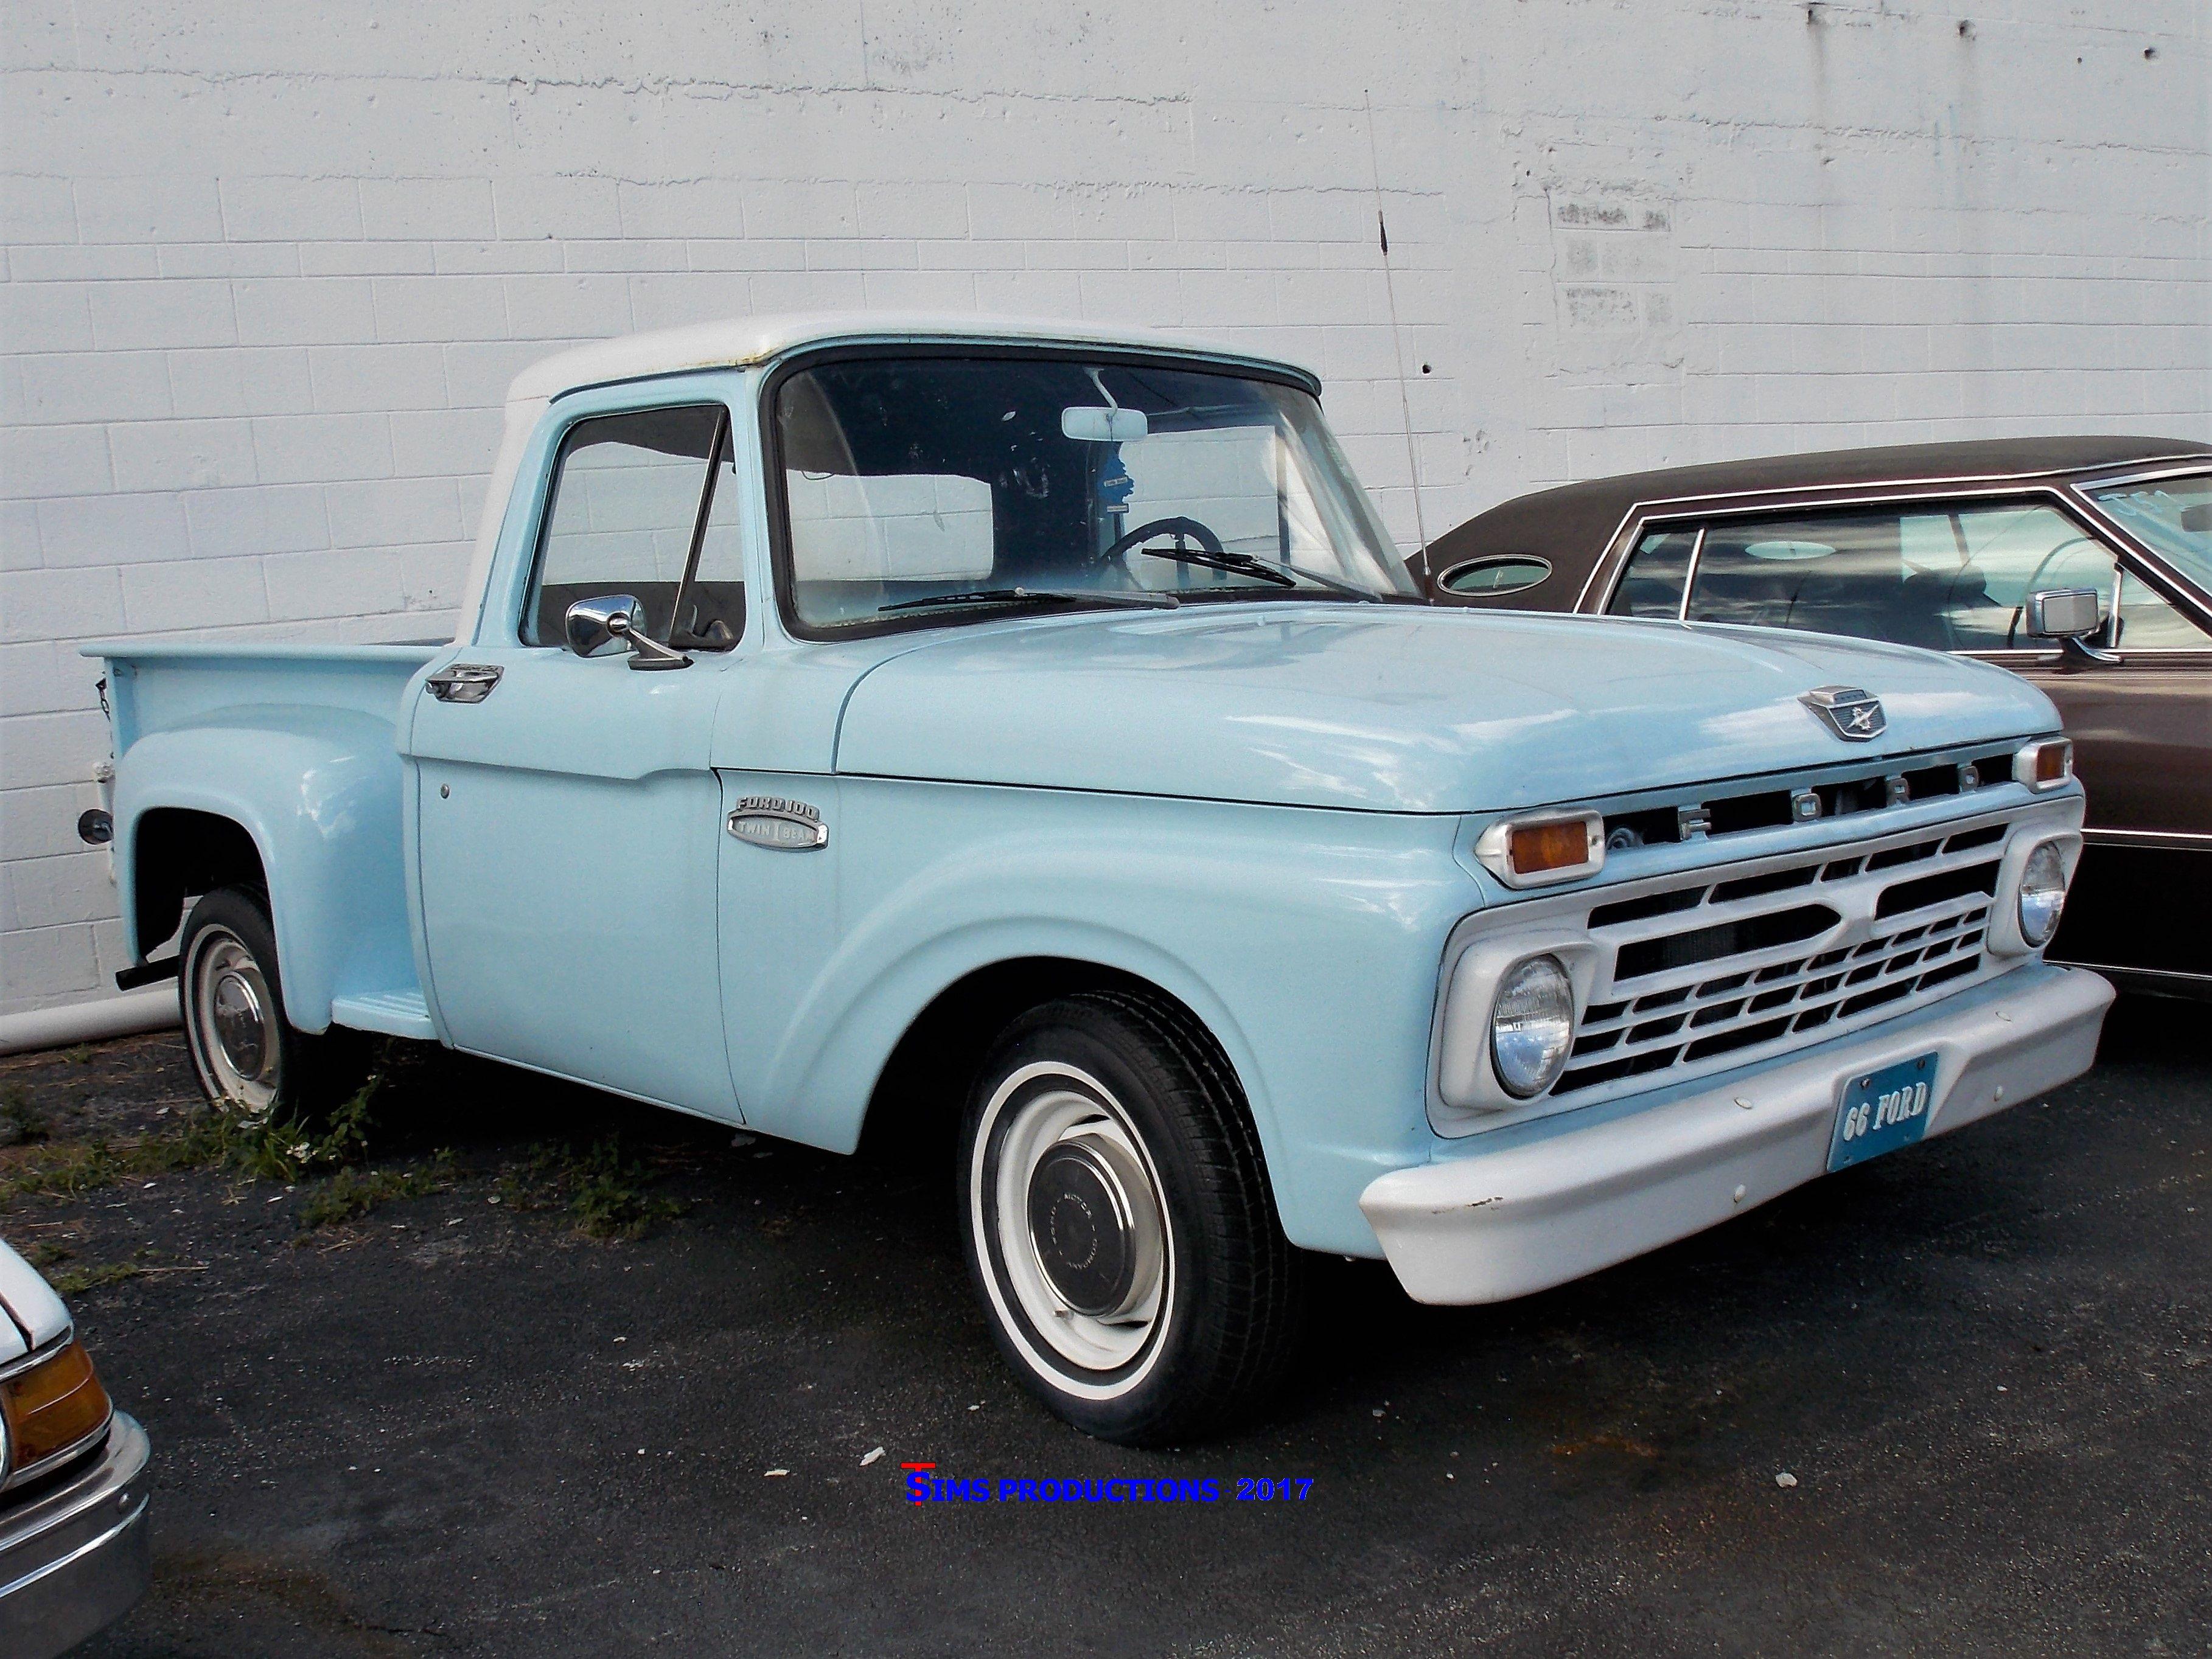 medium resolution of 1966 ford f100 stepside pickup truck vintageauto antiqueauto